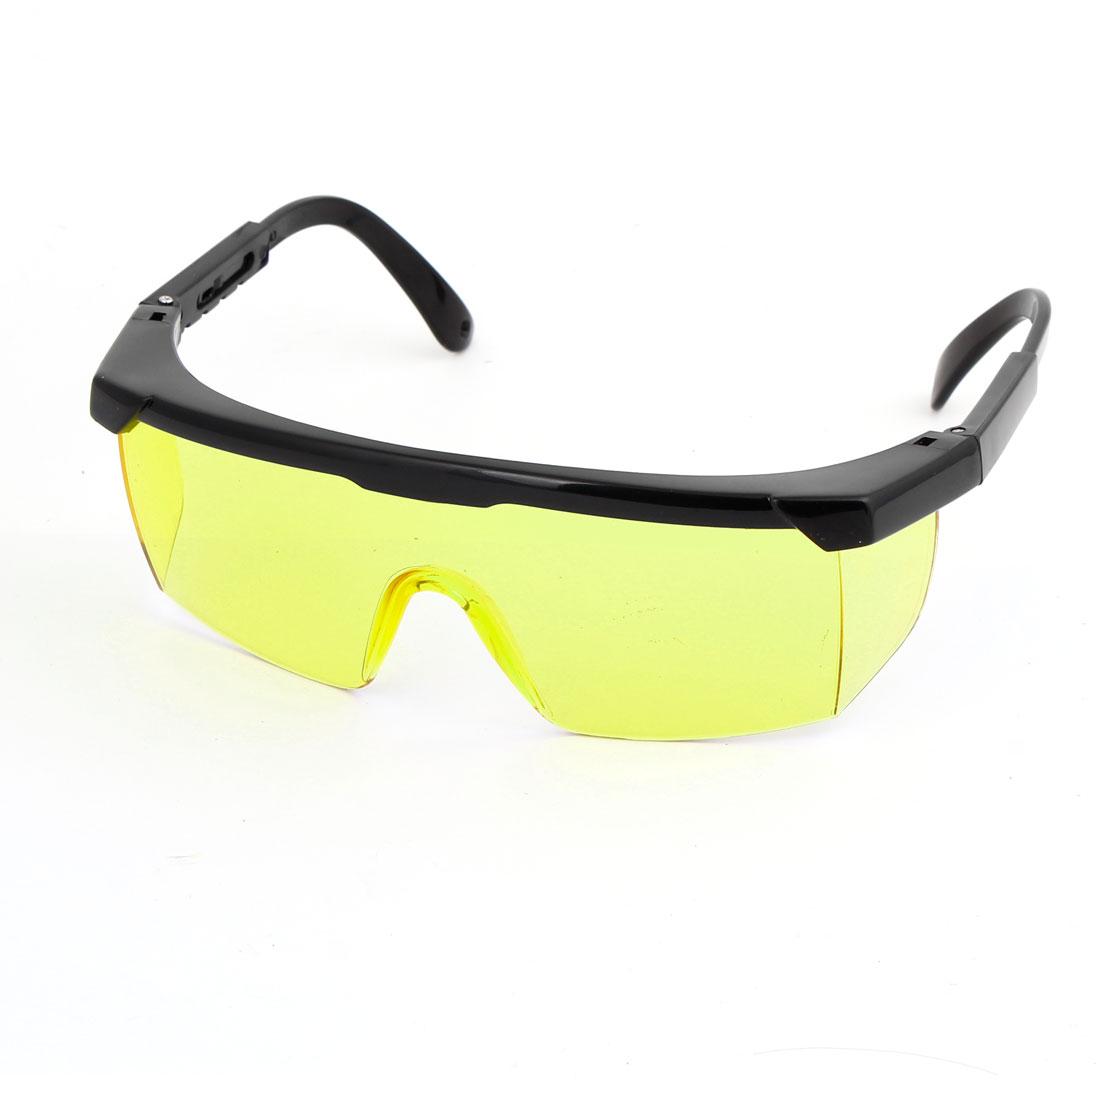 Men Protective Single Bridge Yellow Lens Black Frame Plastic Arms Safety Eyeglasses